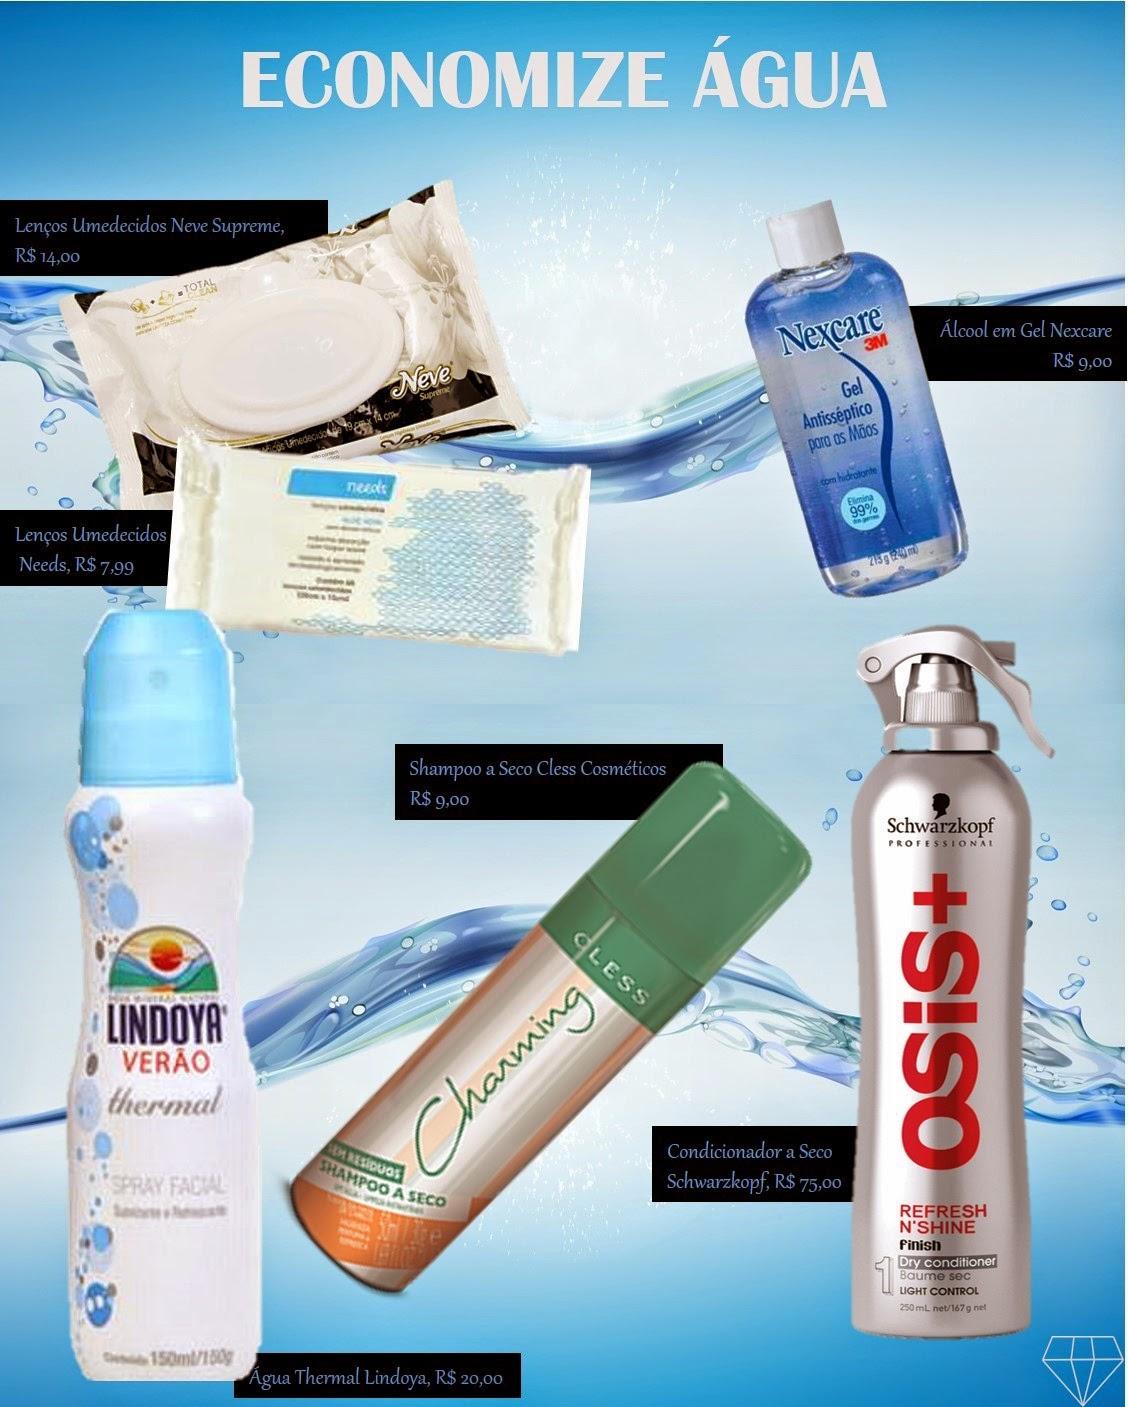 cosmeticos para economizar agua